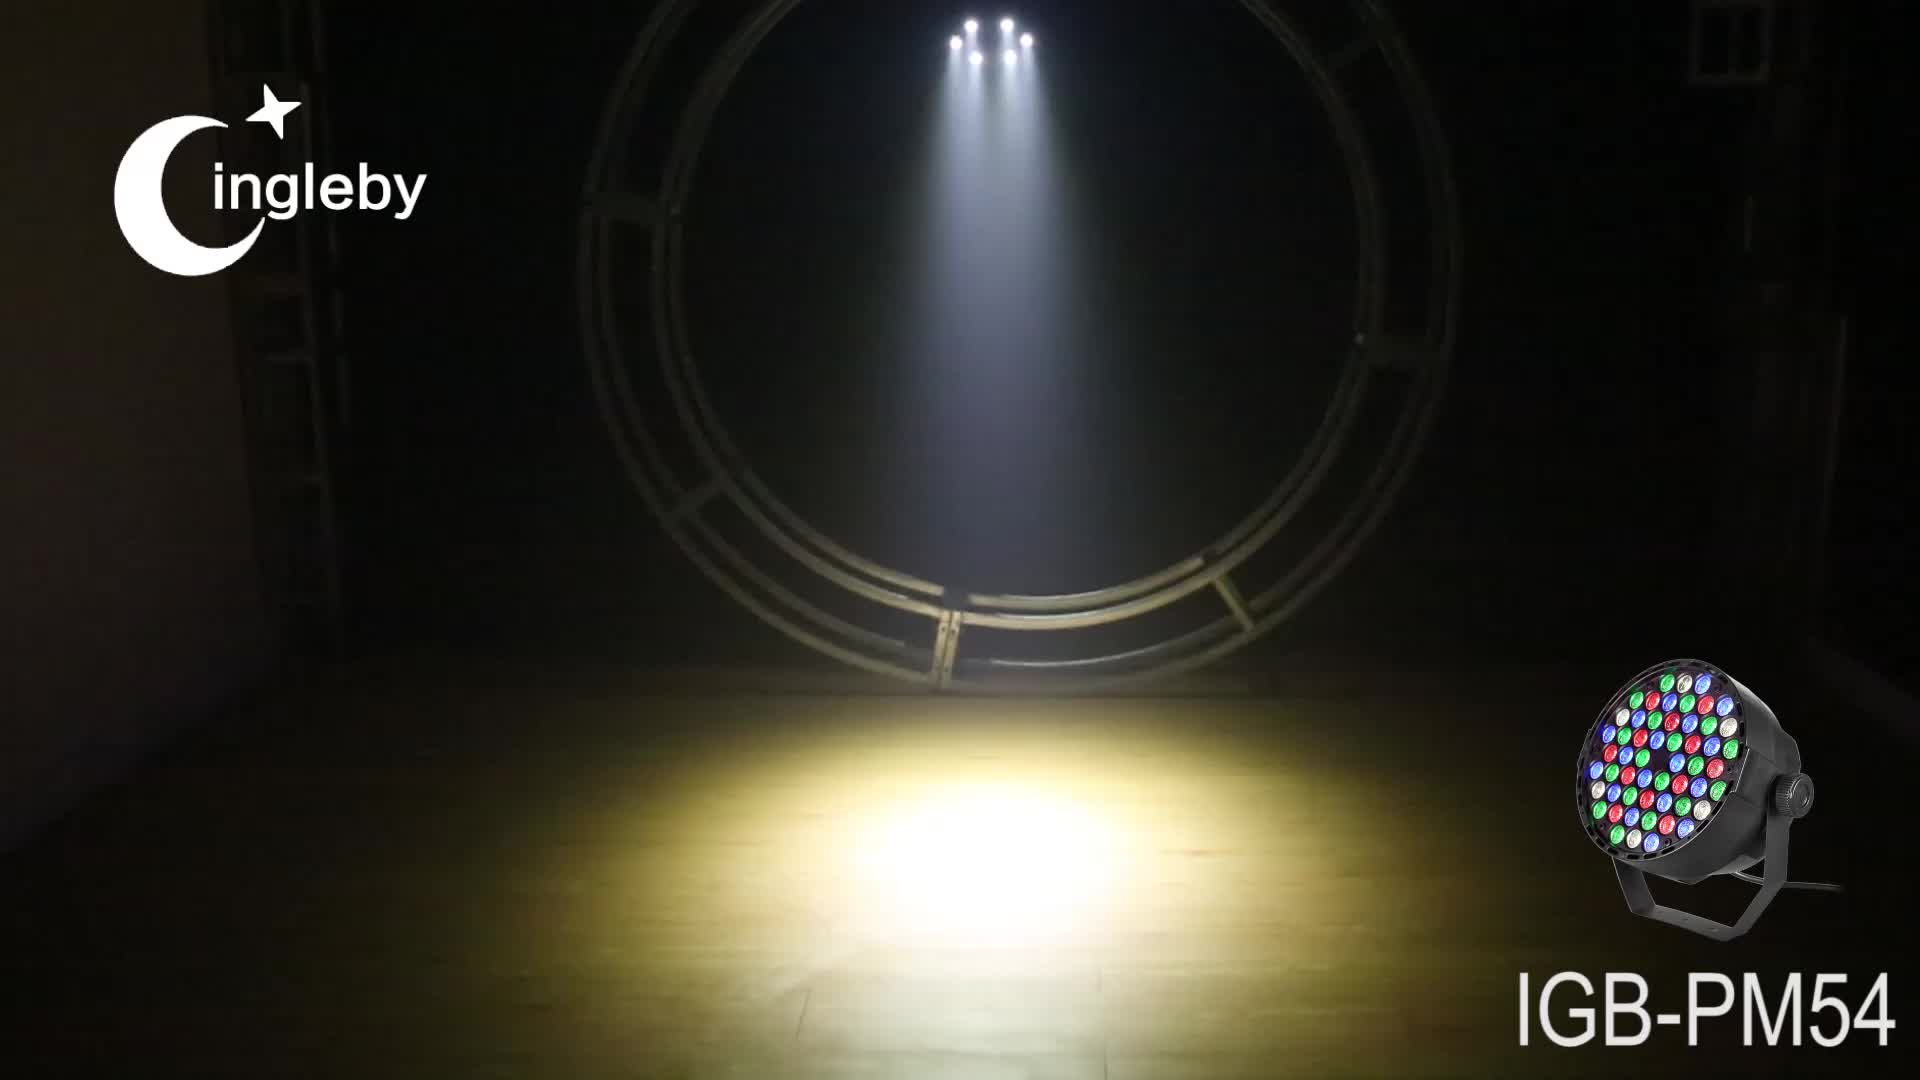 Dongguan factory 54*1w rgb led par strobe light moving head goodwill lighting